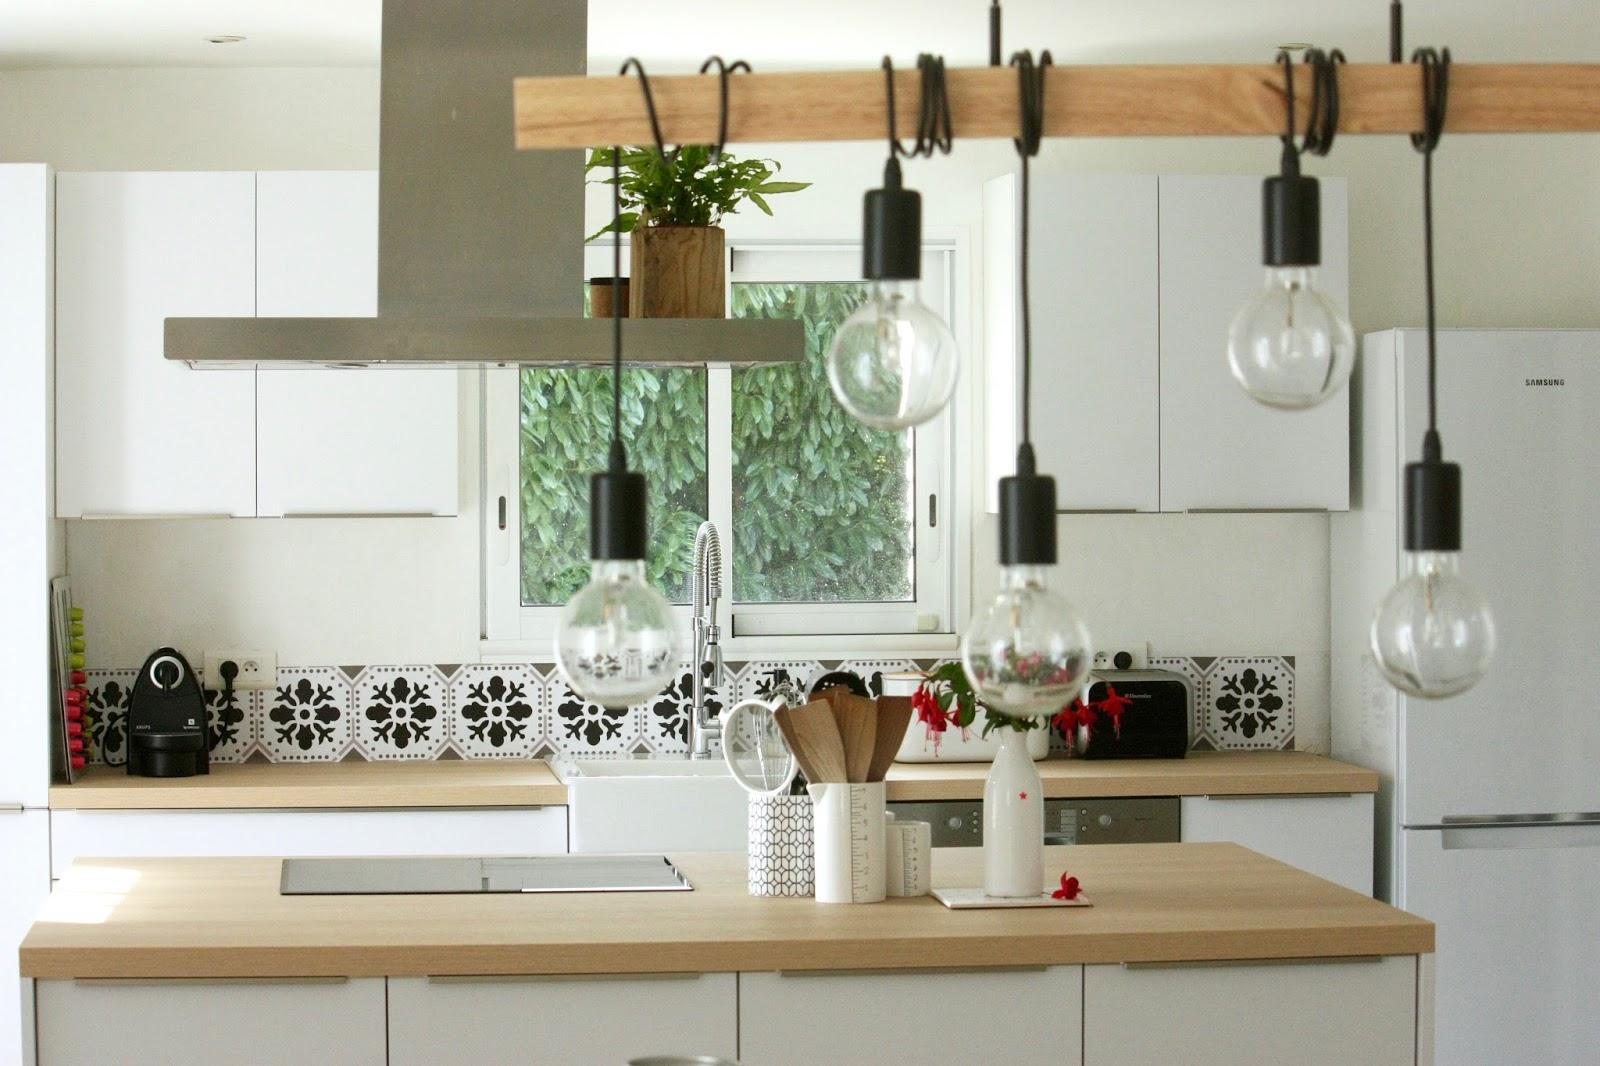 un nouveau regard notre cuisine socoo 39 c. Black Bedroom Furniture Sets. Home Design Ideas